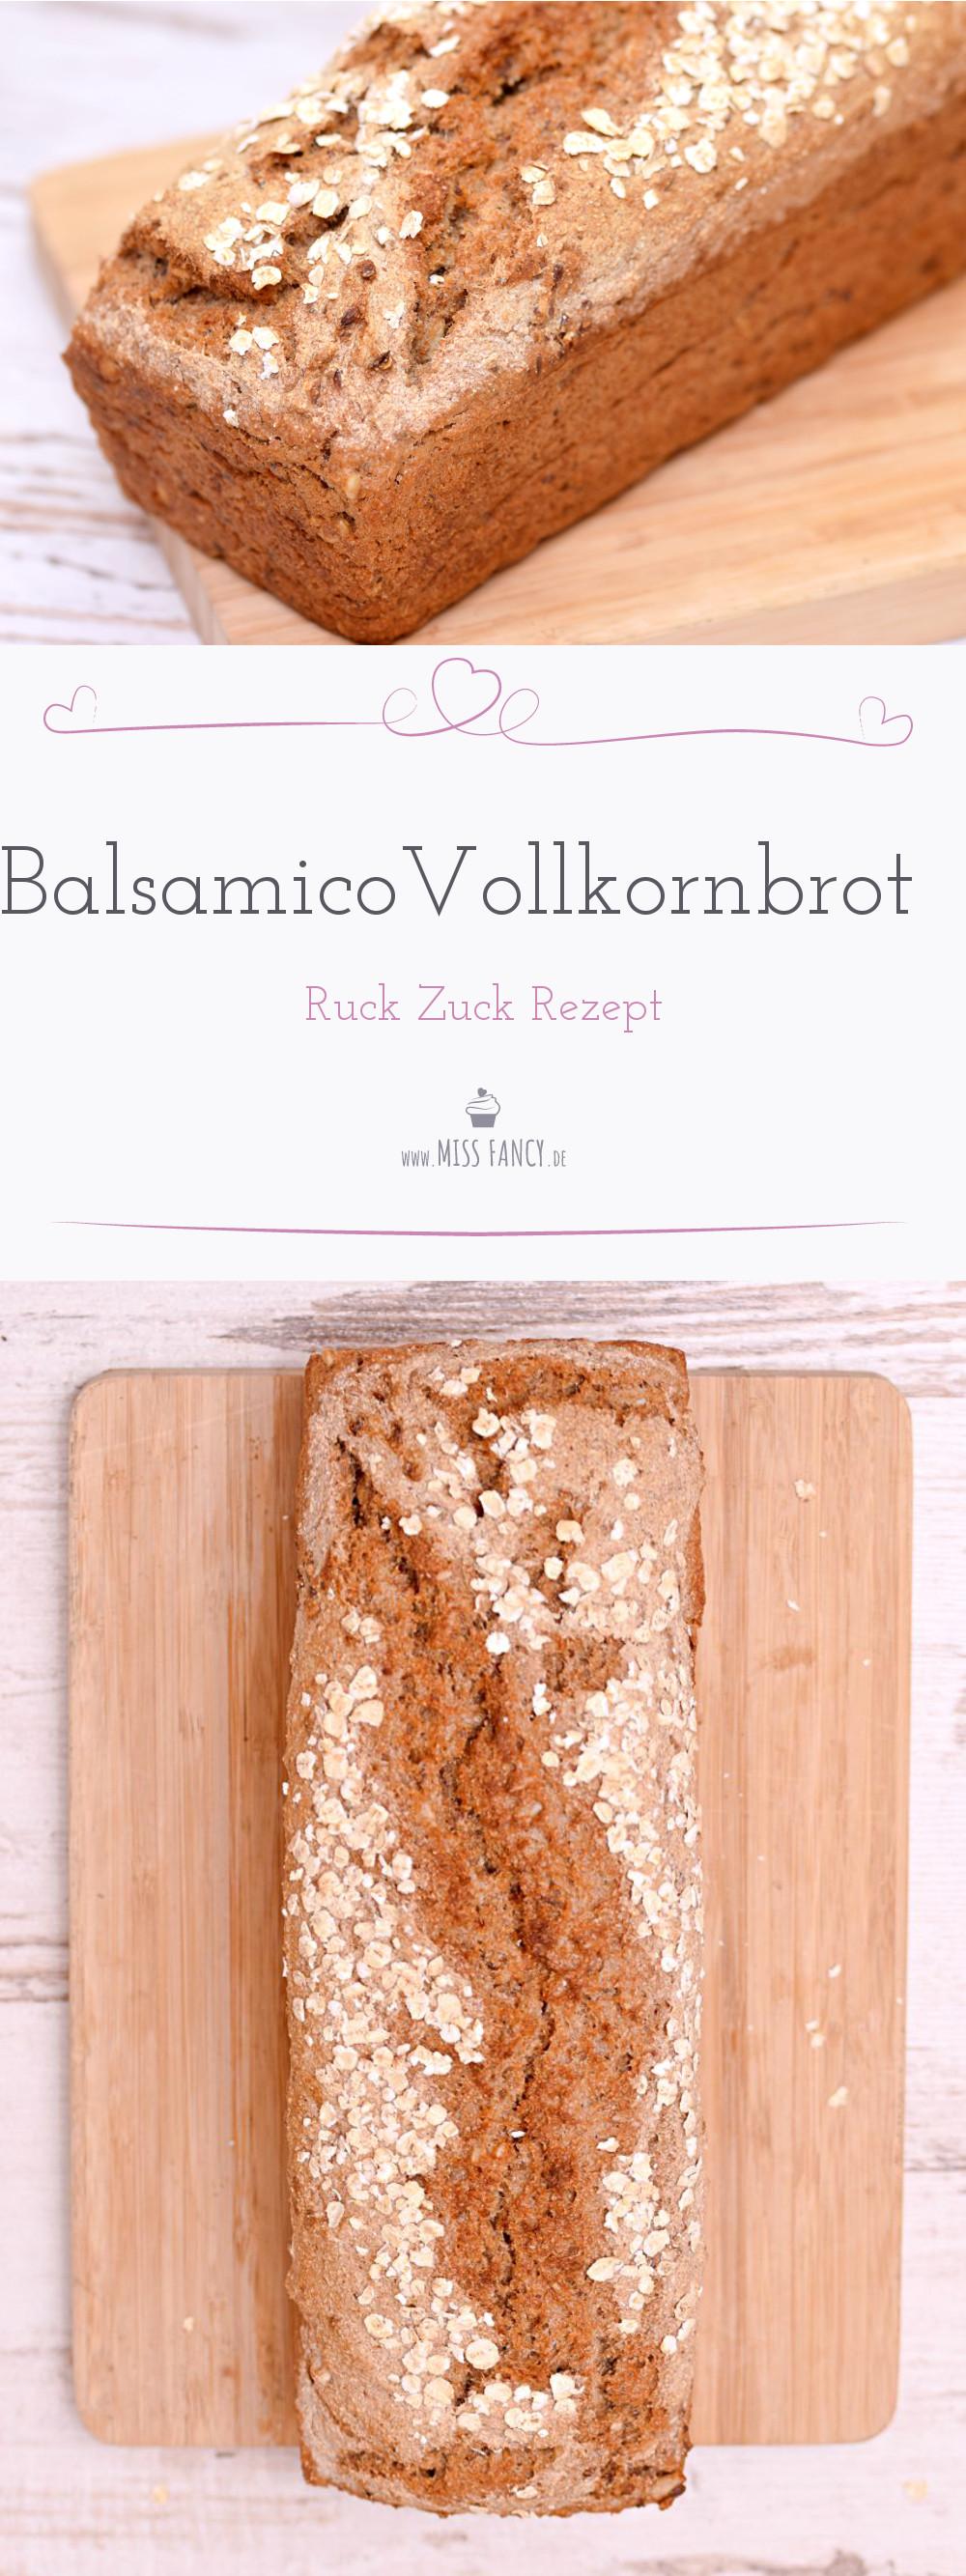 Rezept-balsamico-vollkornbrot